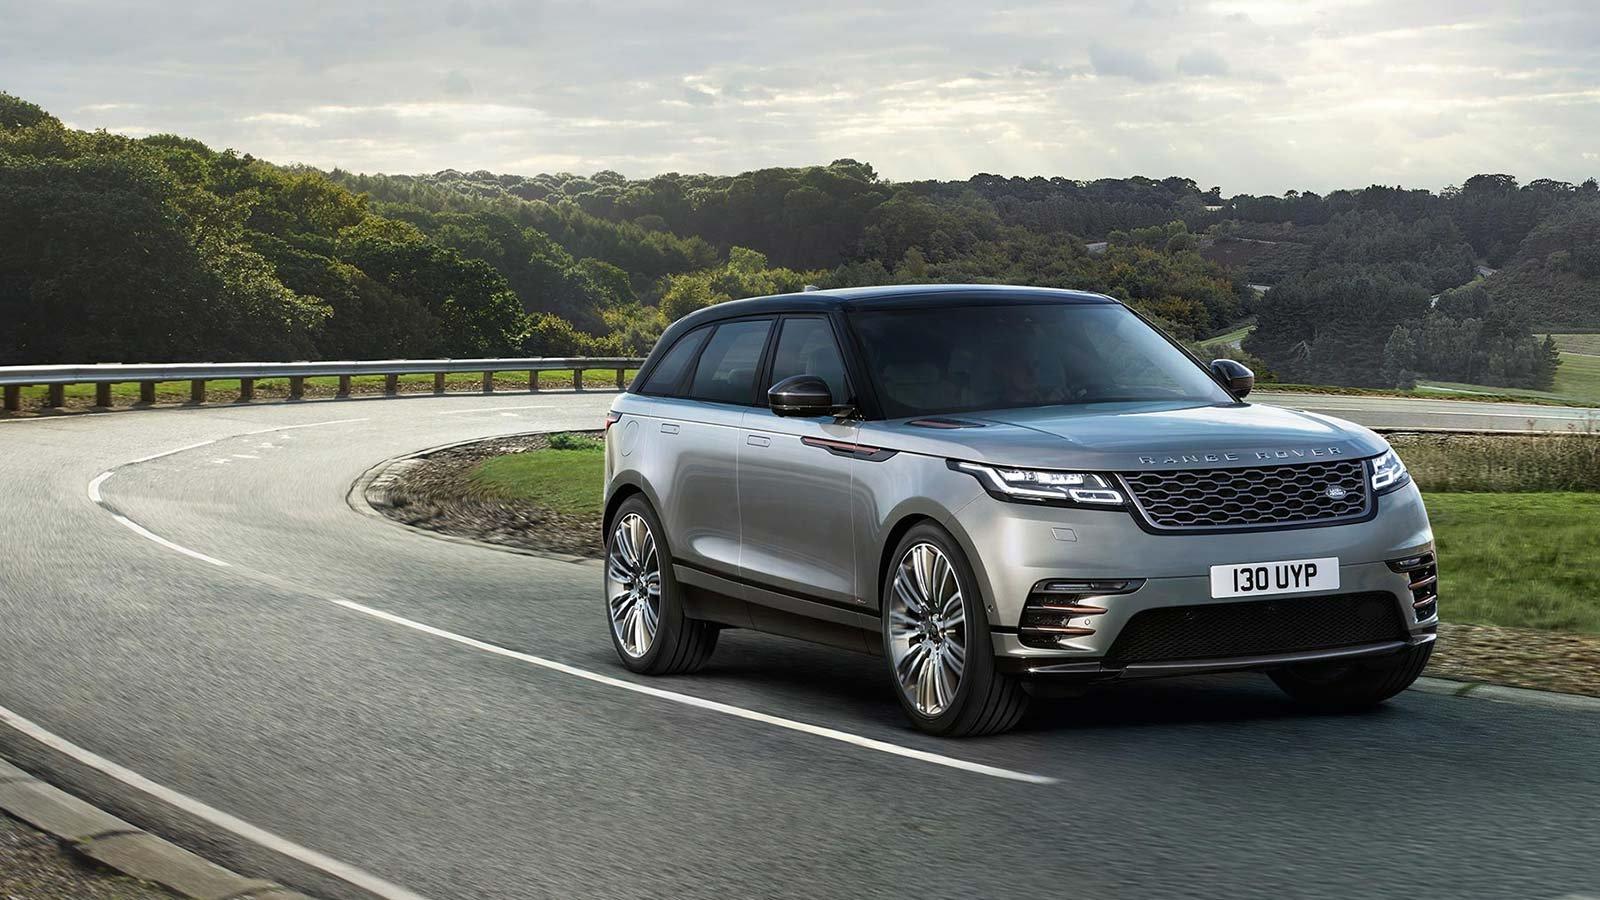 Giá xe Range Rover Velar mới nhất tại VIệt Nam....